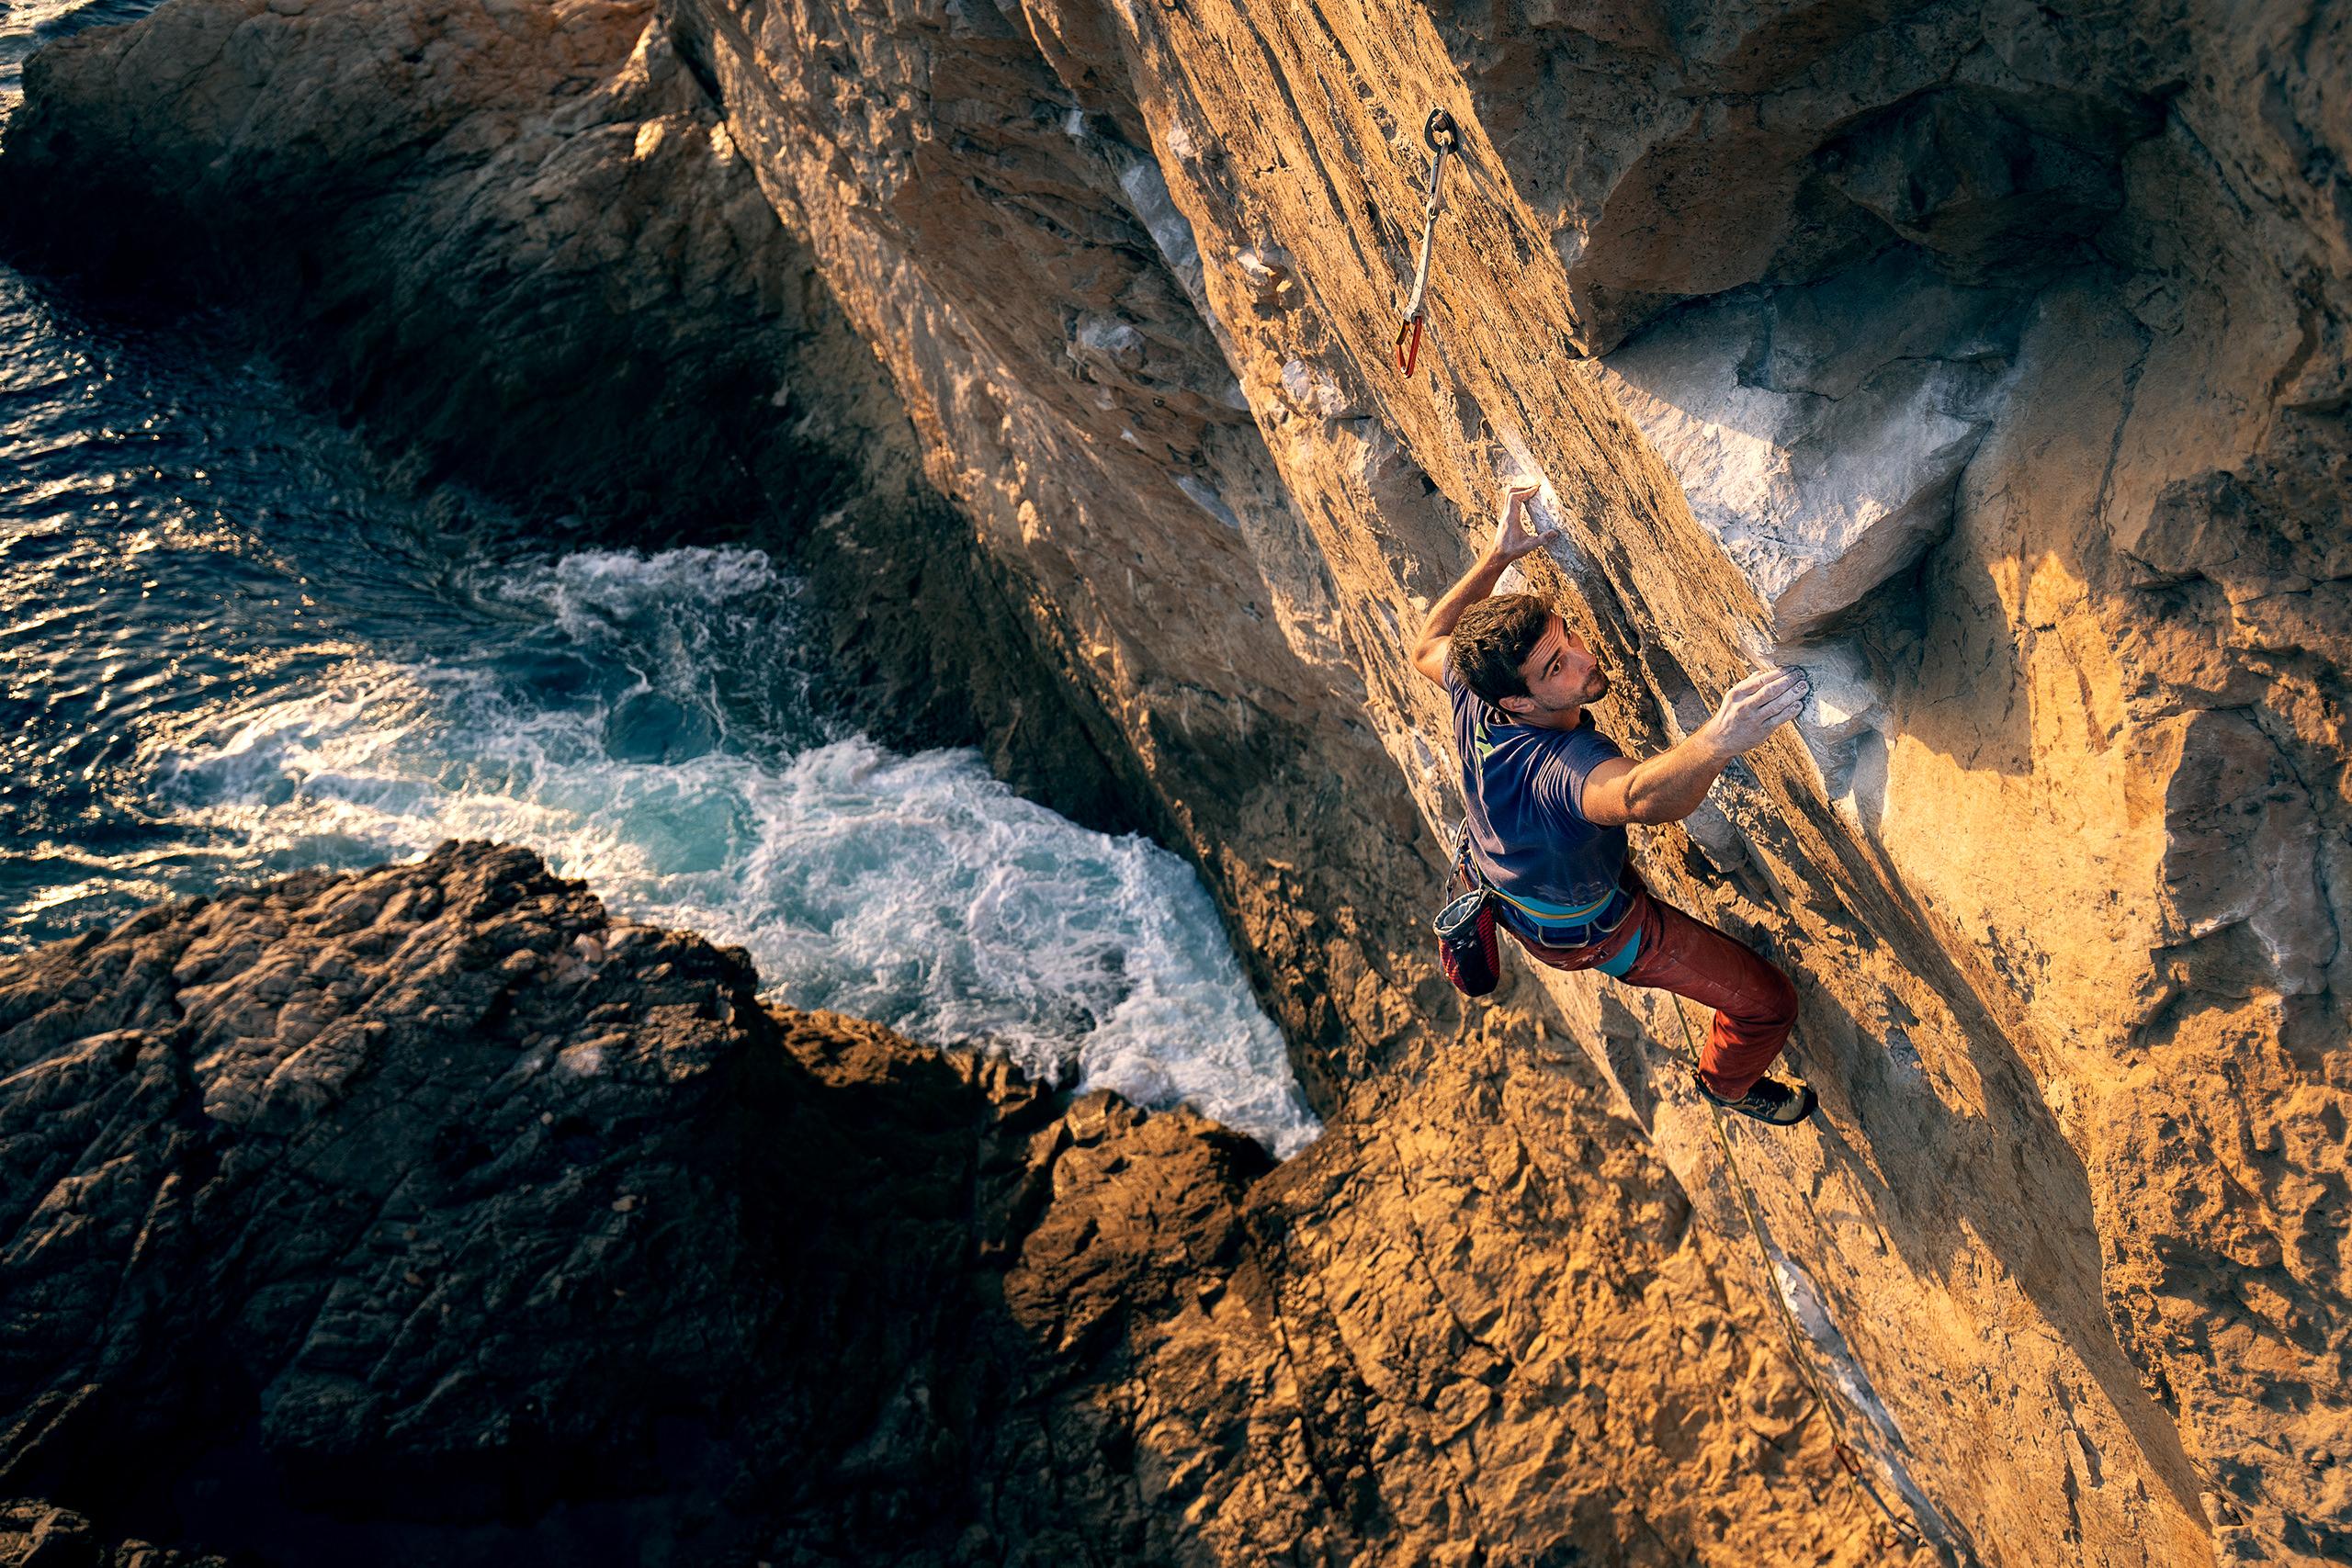 Lisbon Climbing Guide - Tiago Martins climbing Guardador de Rebanhos (8a+) in Atlântida ©Martim Vidigal